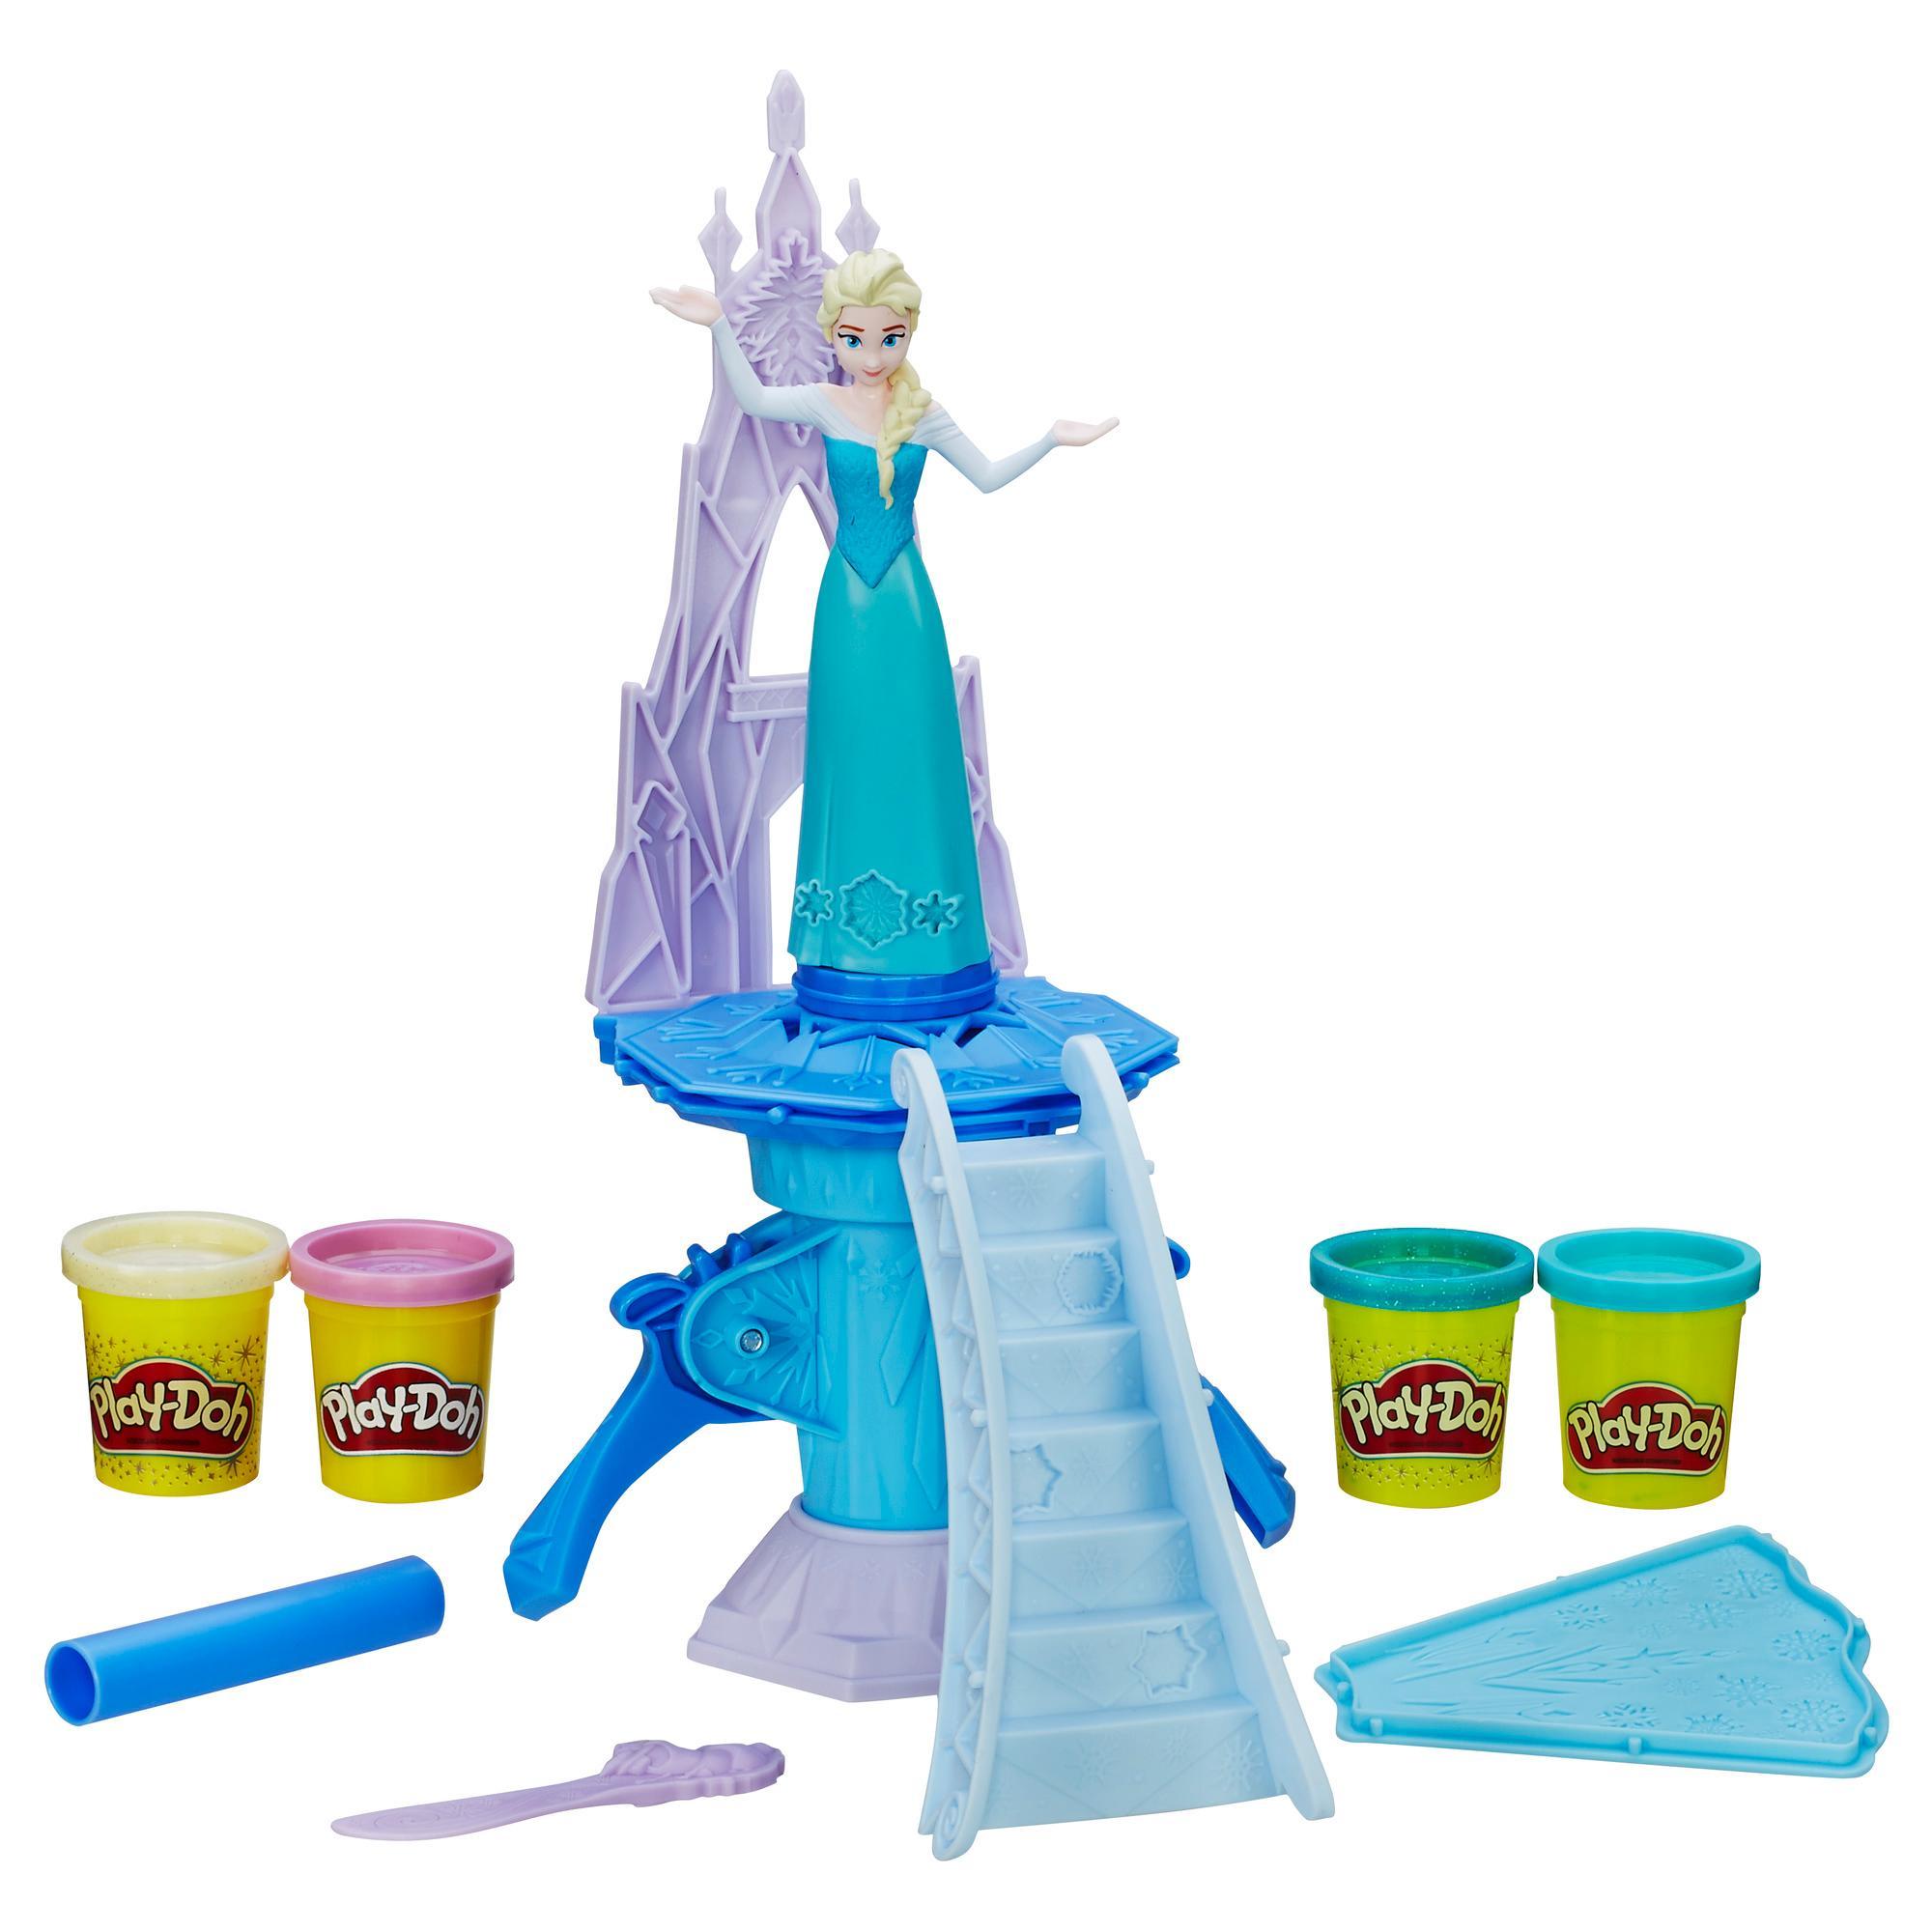 Play-Doh Frozen - Castillo de hielo encantado con Elsa